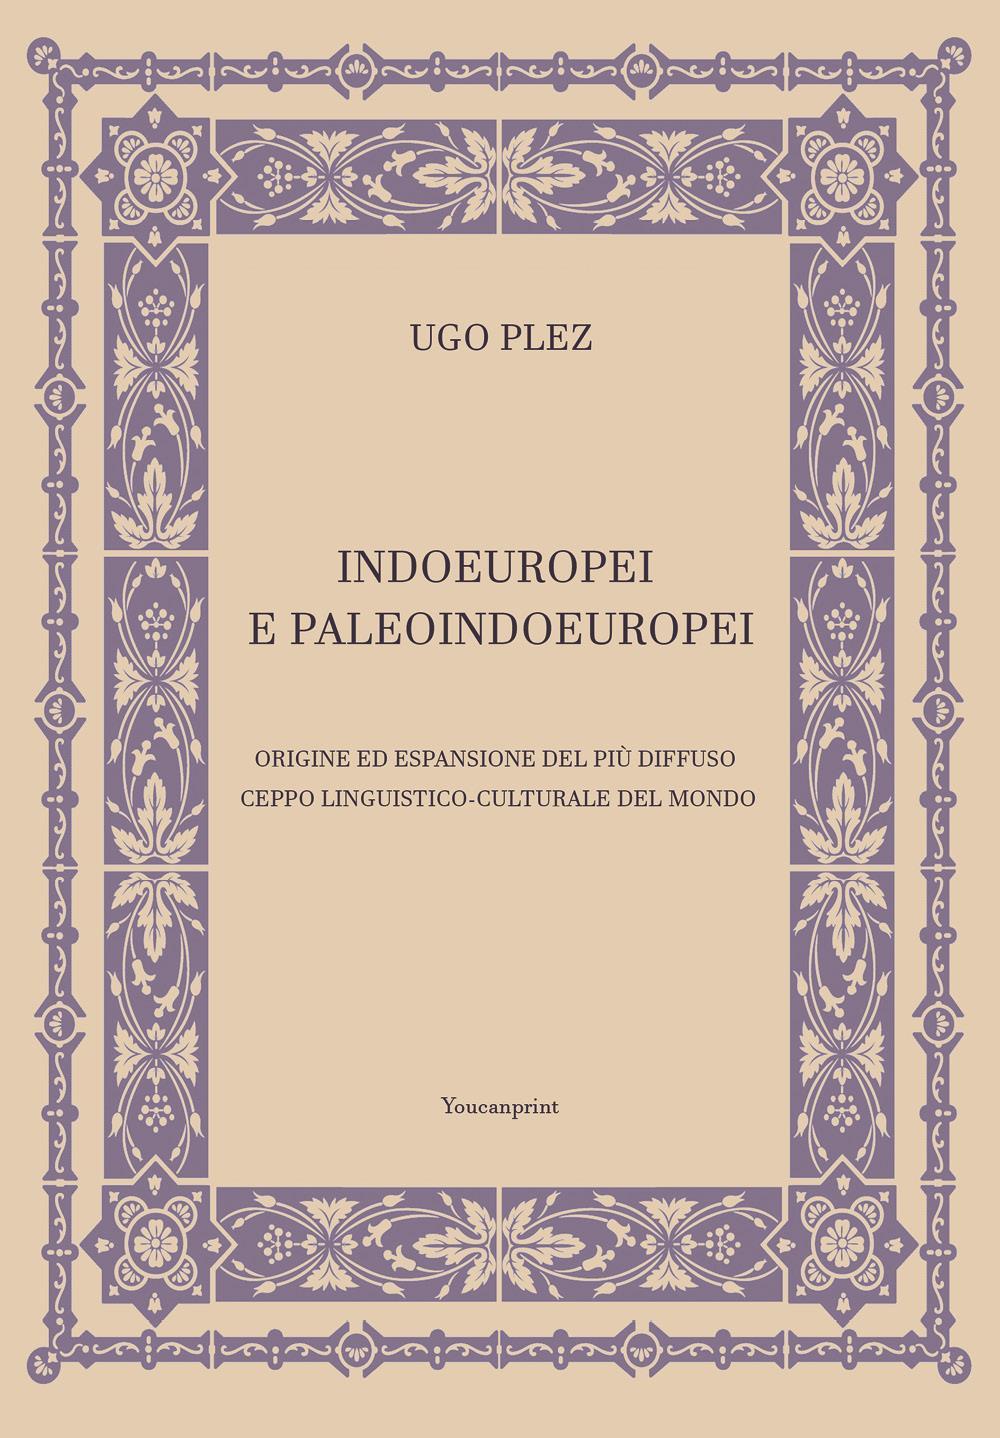 Indoeuropei e paleoindoeuropei